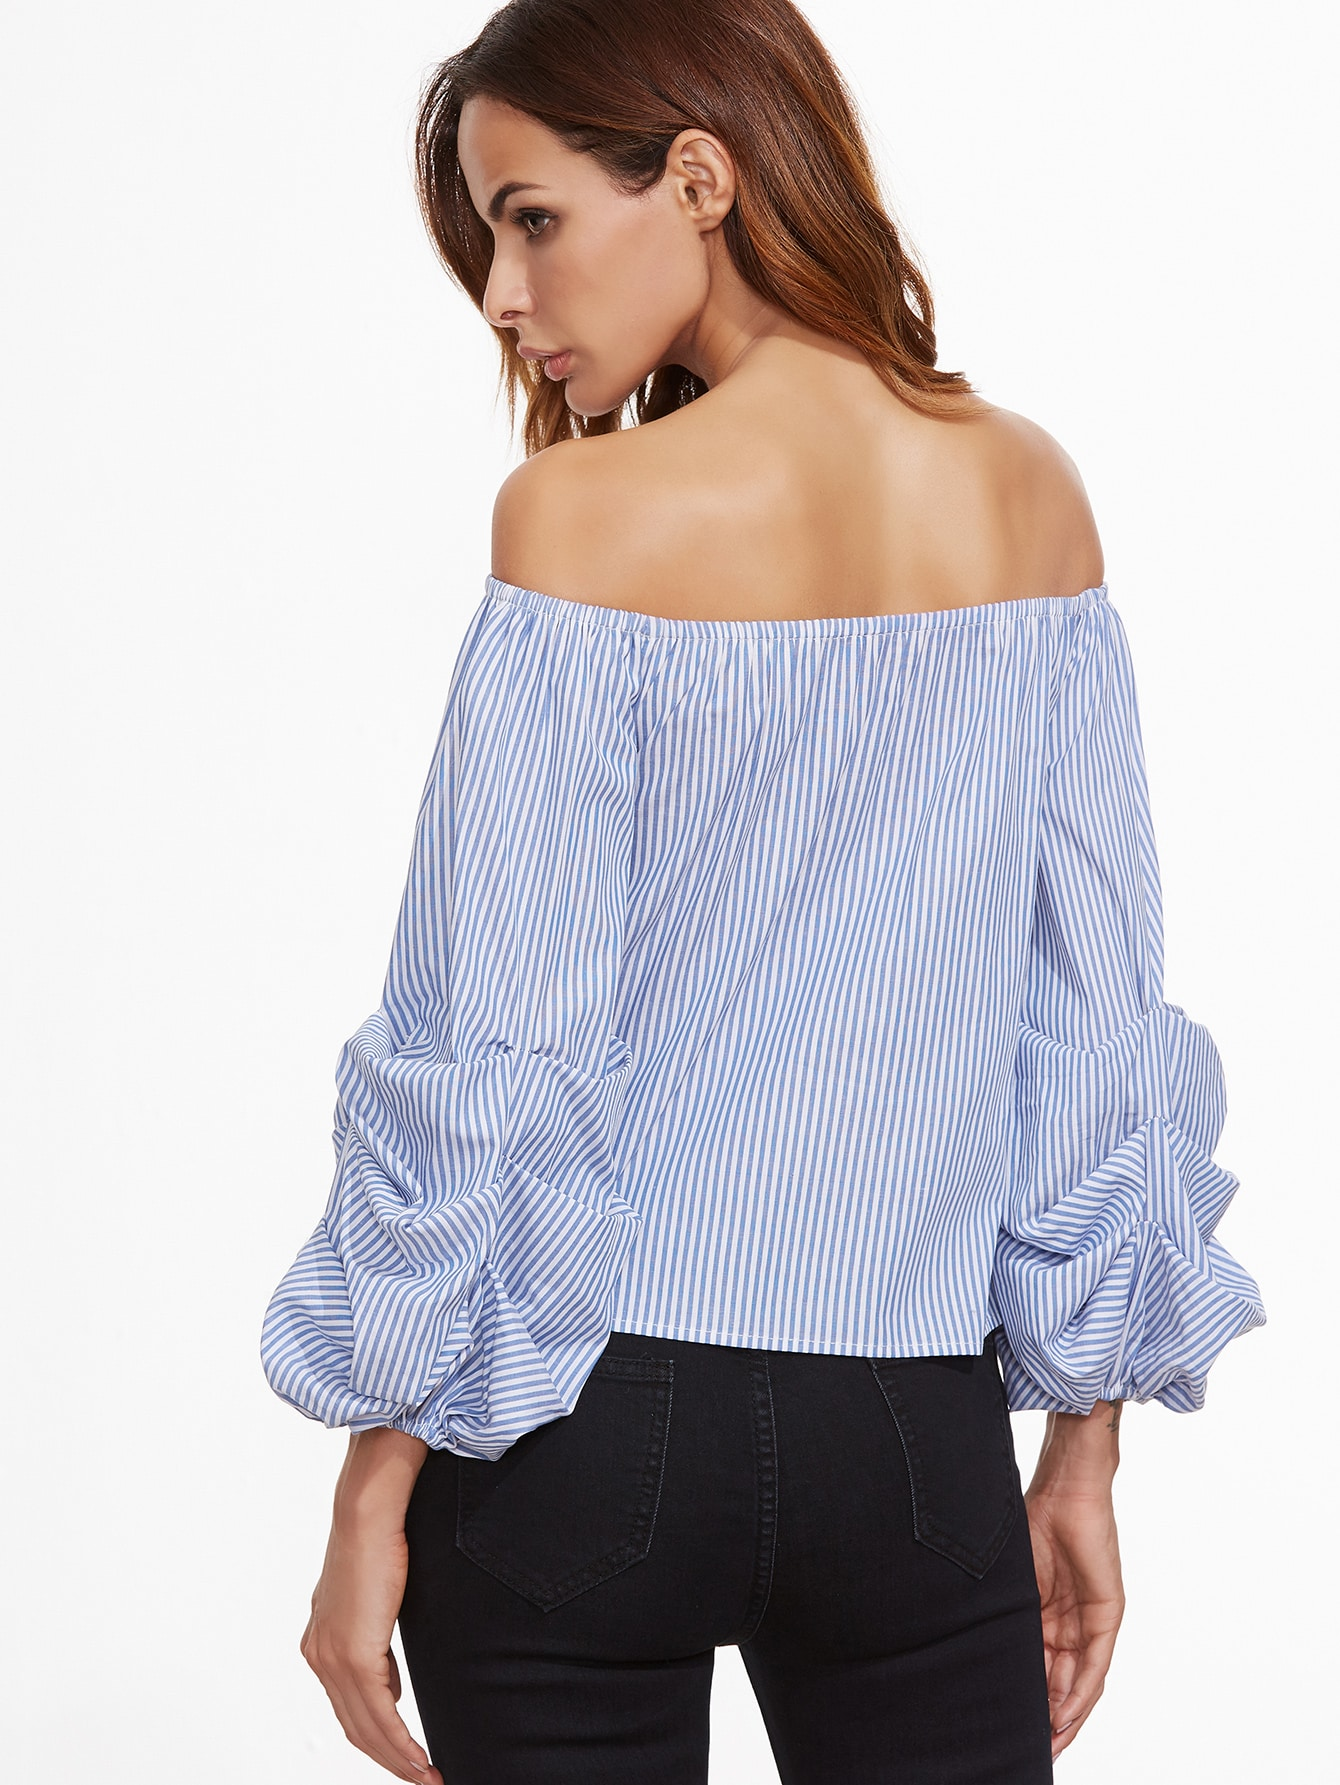 blouse161025702_2